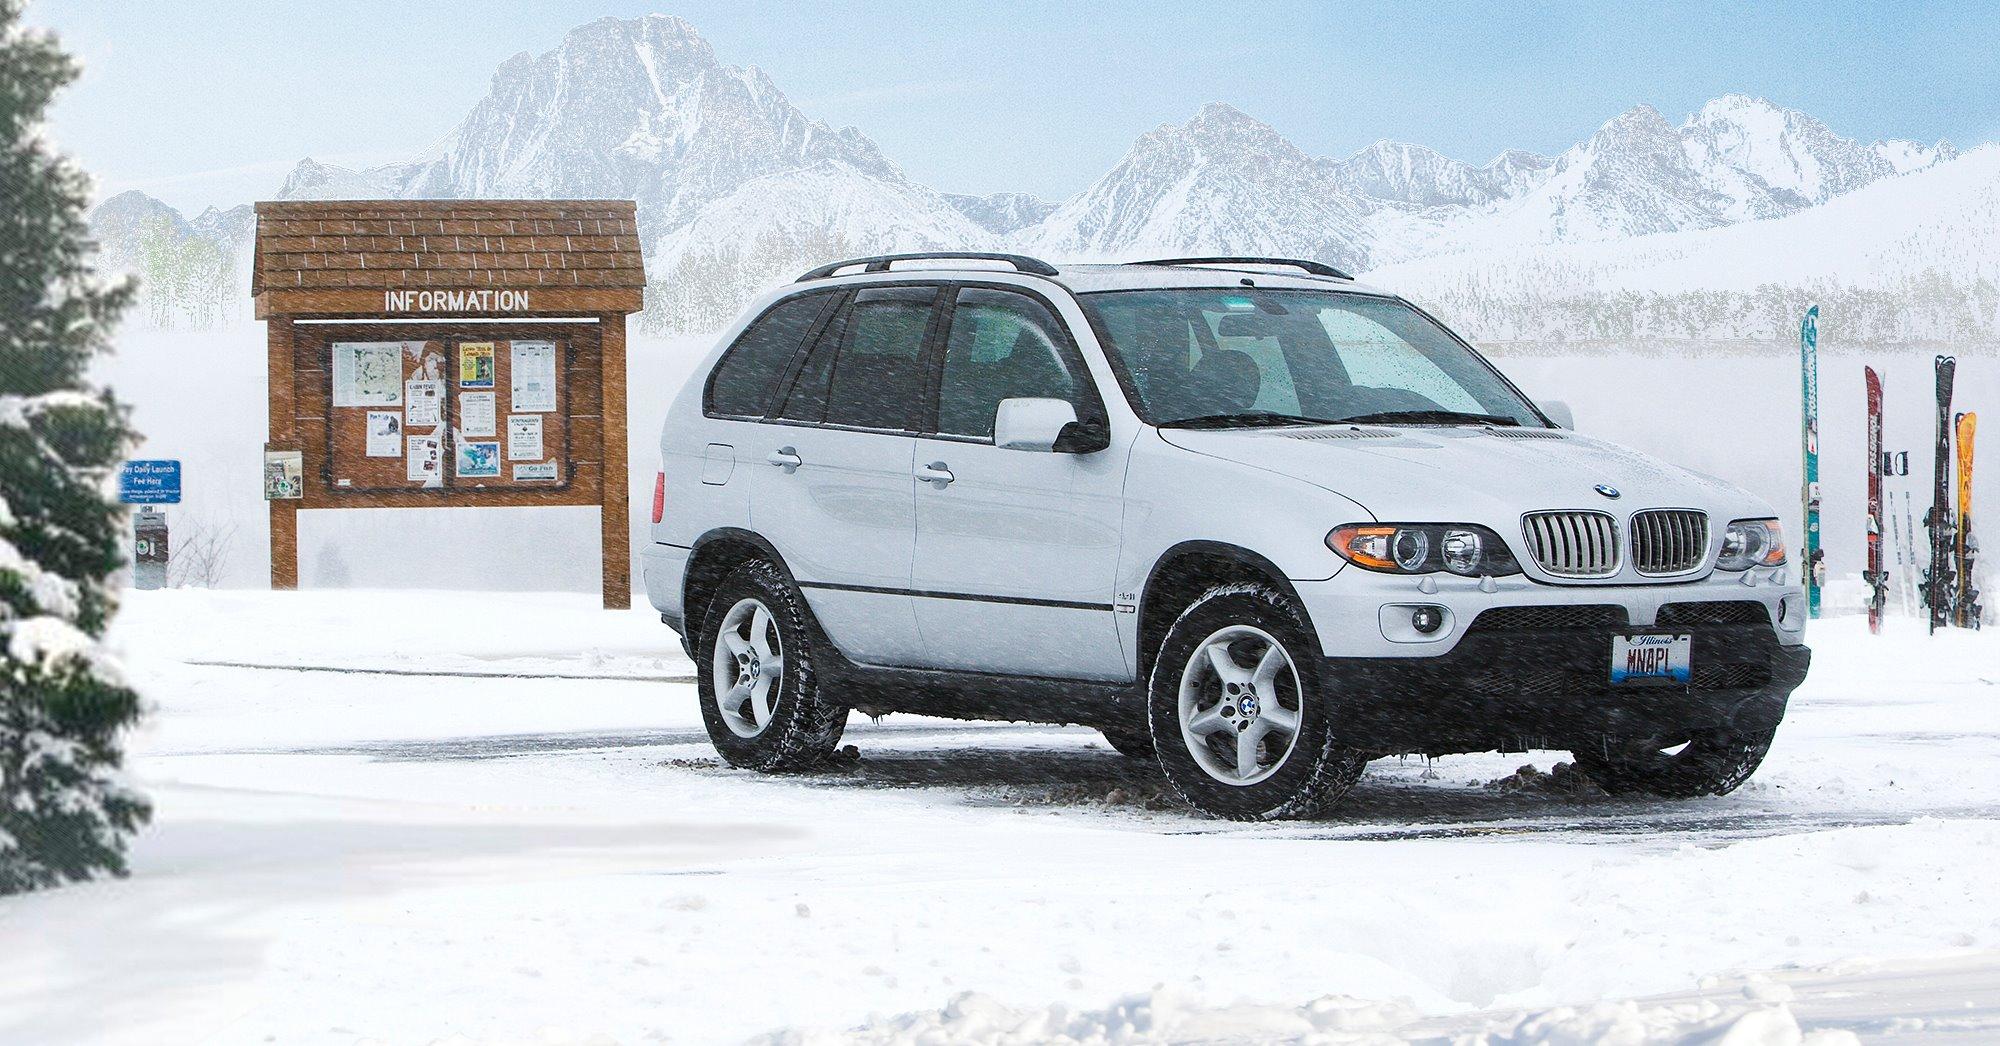 Vehicle on mountainside